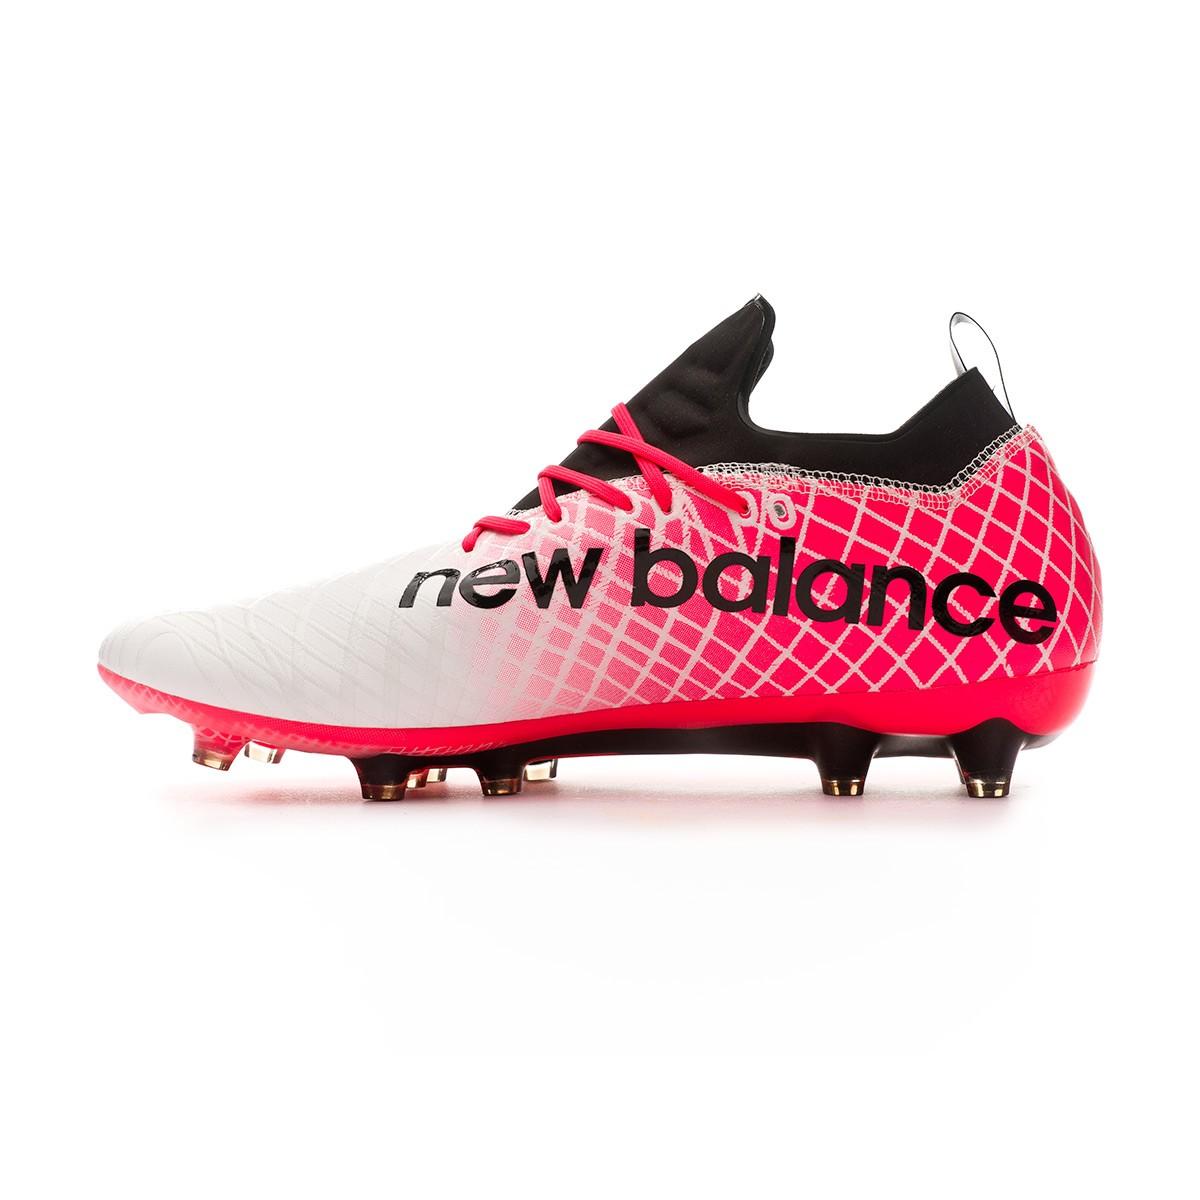 7d4cfbf7808f6 Scarpe New Balance Tekela 1.0 Pro FG Bright cherry - Negozio di calcio  Fútbol Emotion